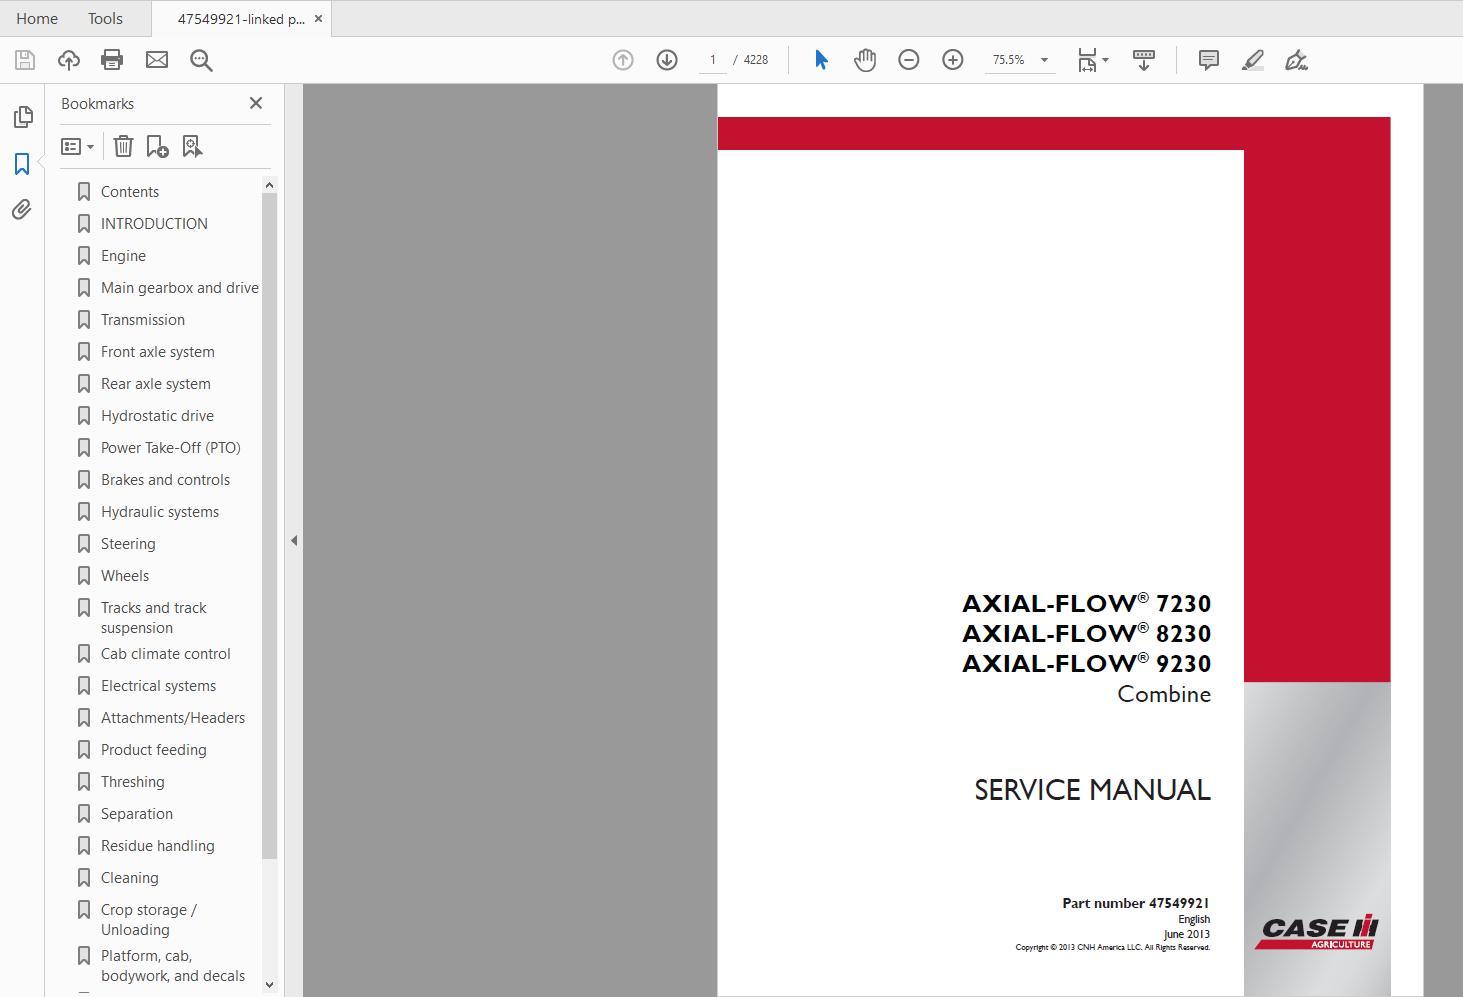 Case_IH_Agricultural_2019_Full_Service_Manual_150Gb7